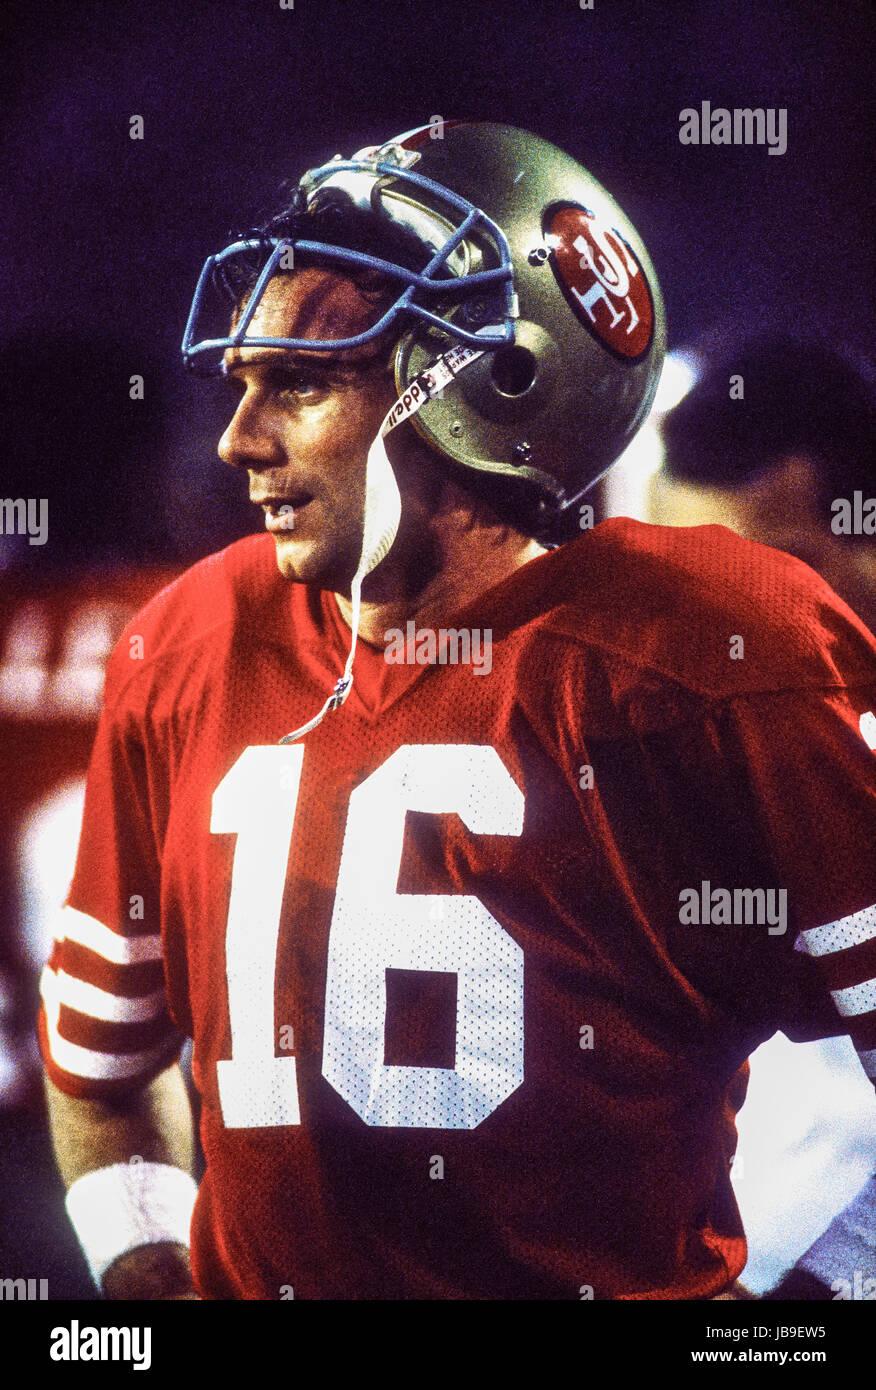 Joe Montana San Francisco 49ers quarterback at the 1989 Super Bowl - Stock Image